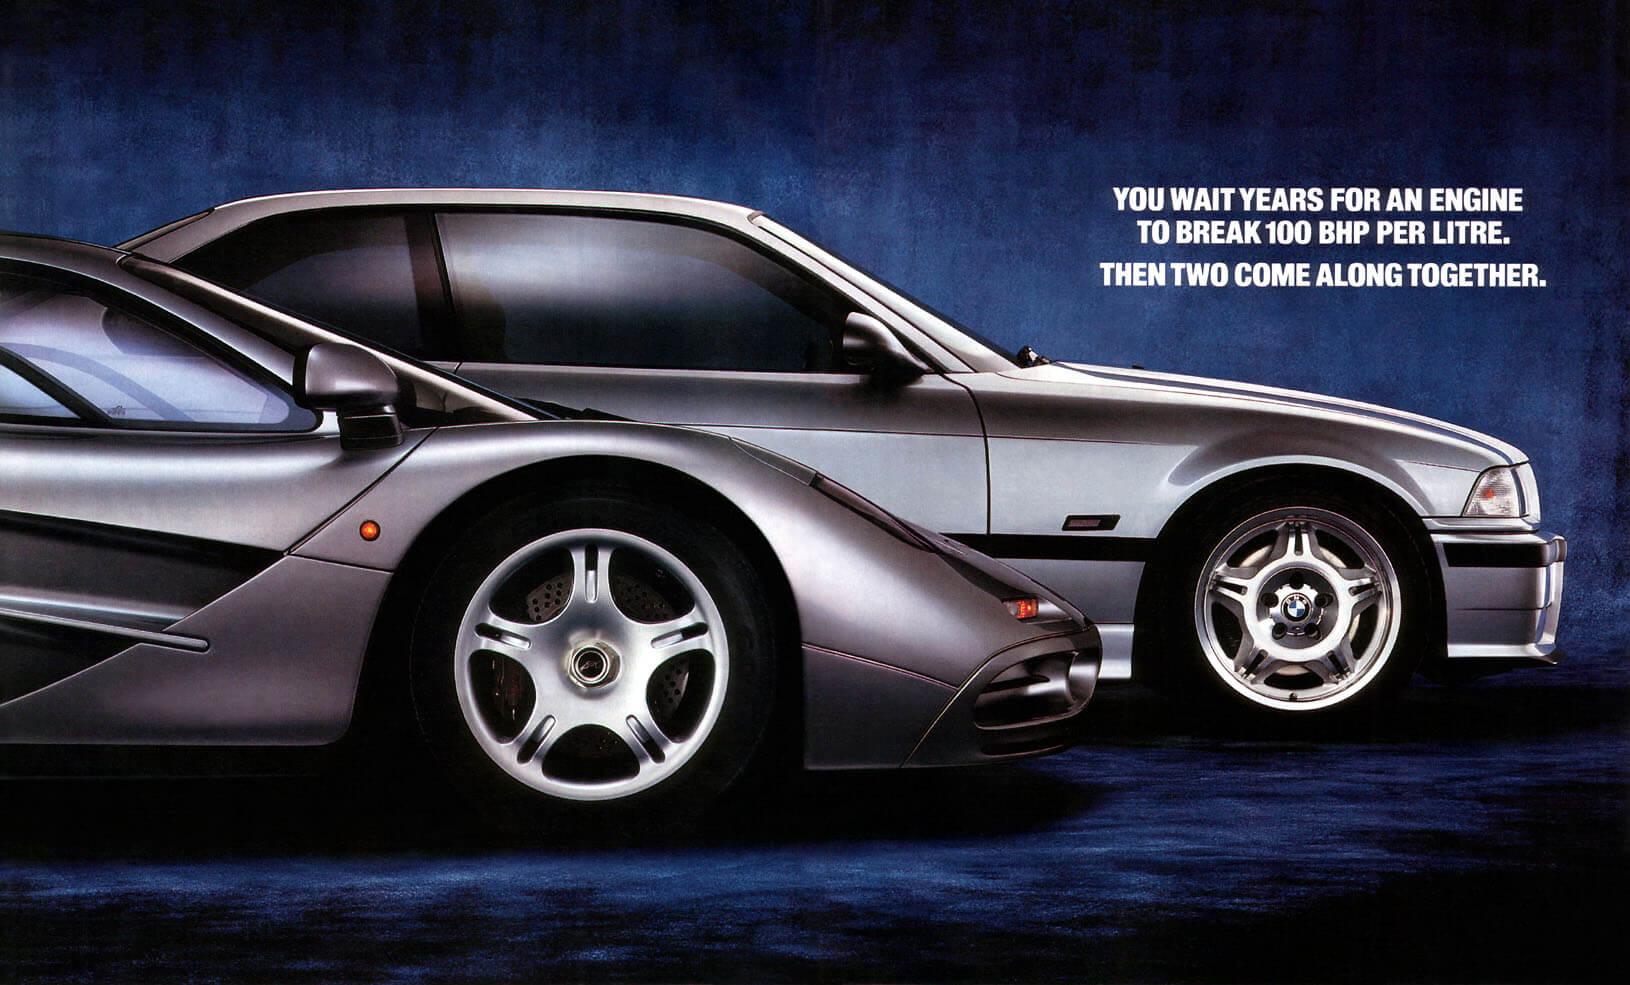 McLaren F1's Mighty BMW Engine Car Ad